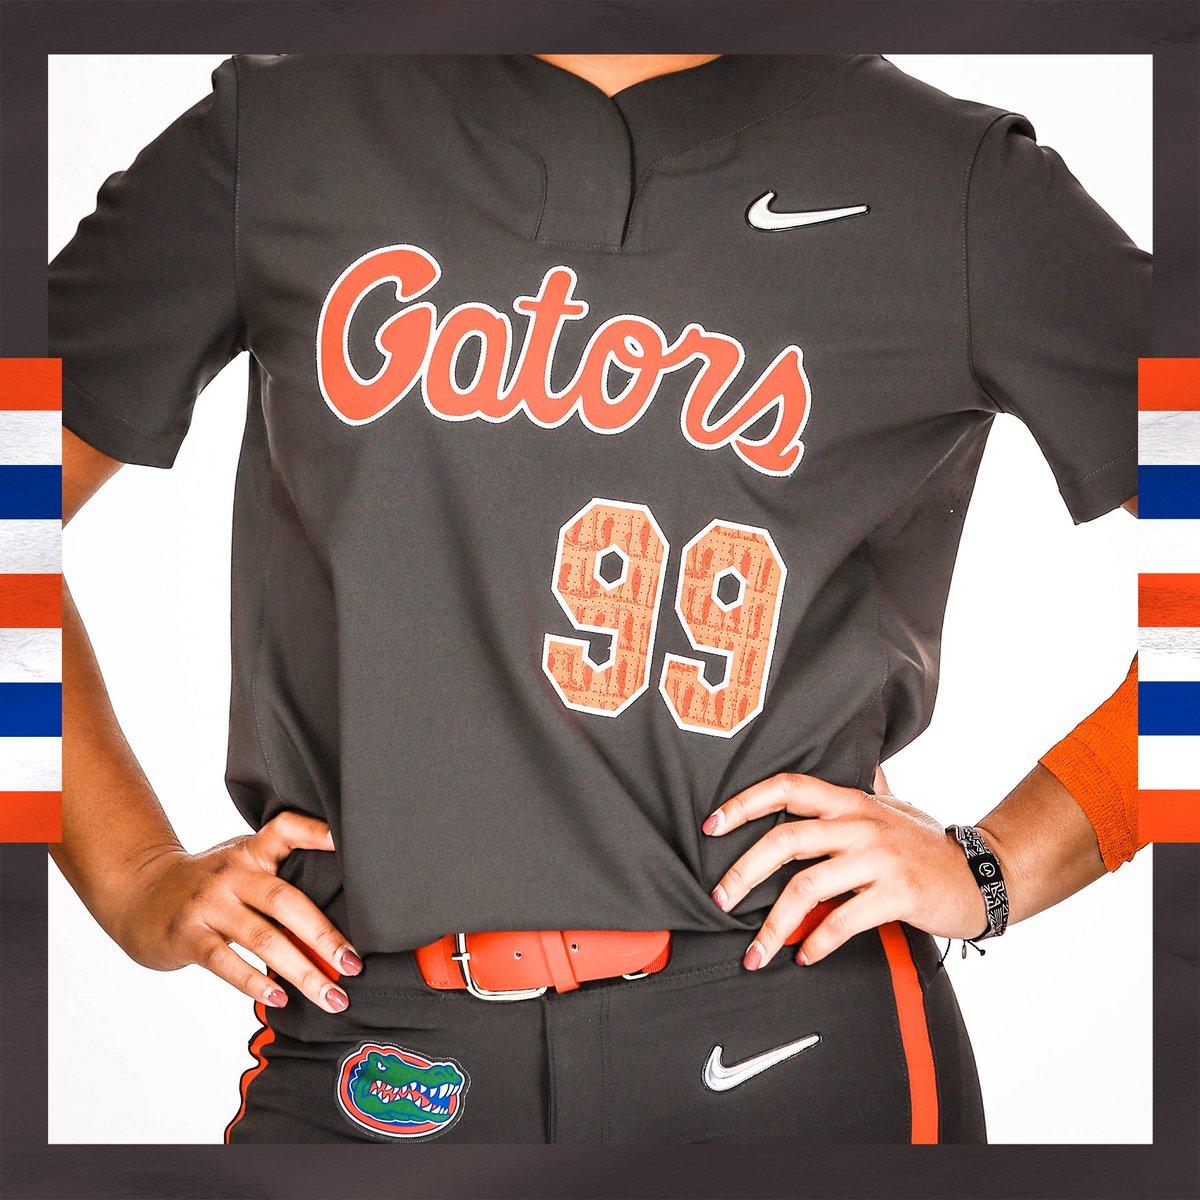 online store 77fcb 21045 Florida Softball Uniforms — UNISWAG